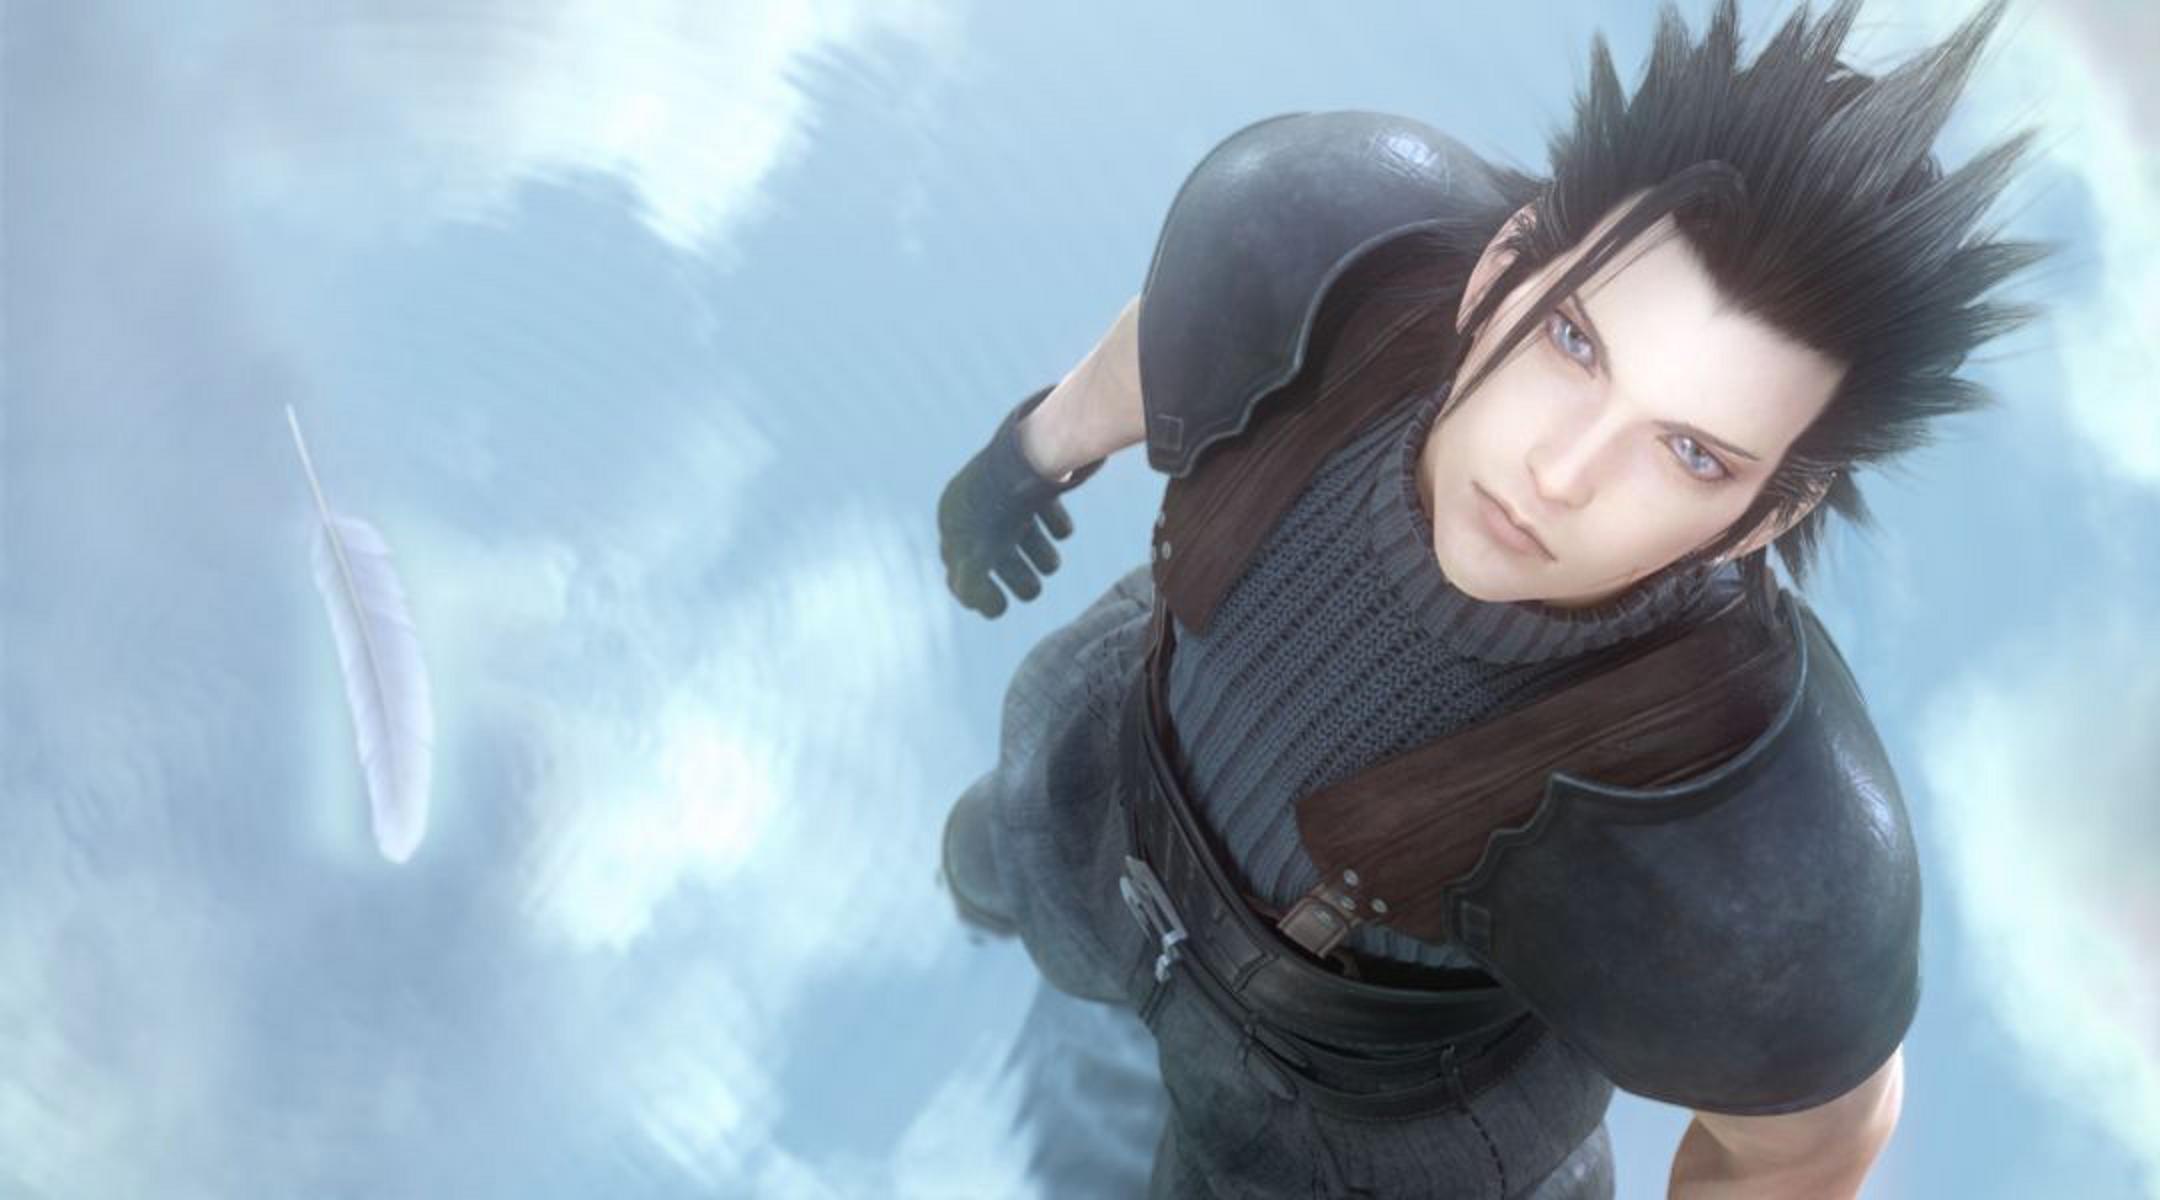 Versus Series  Zack Fair amp Cloud Strife Vs Sephiroth